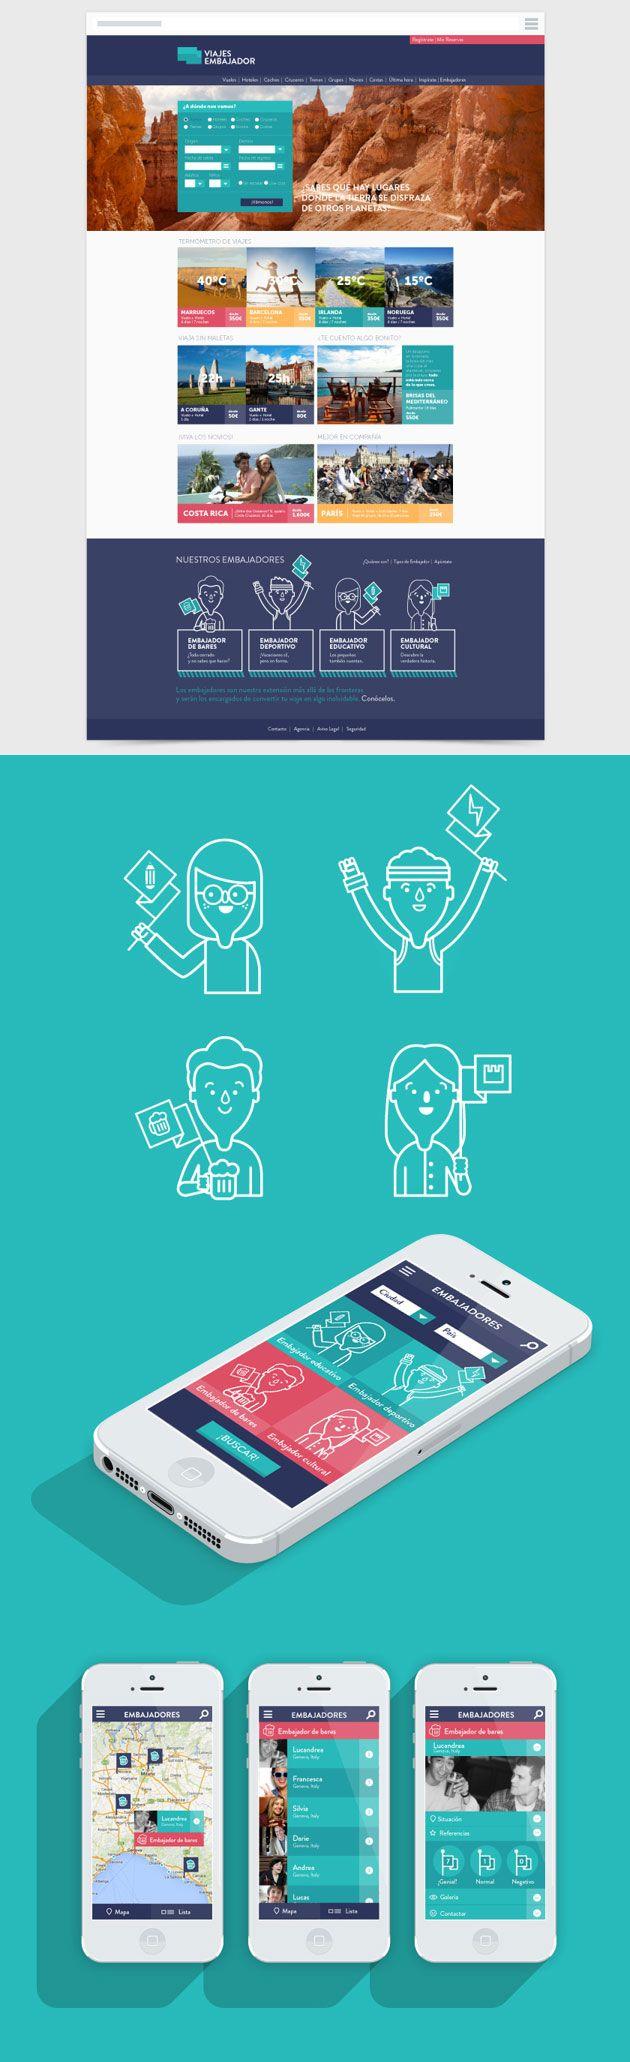 #Infografia Inspiración #DisenoWeb / Flat Design. #TAVnews